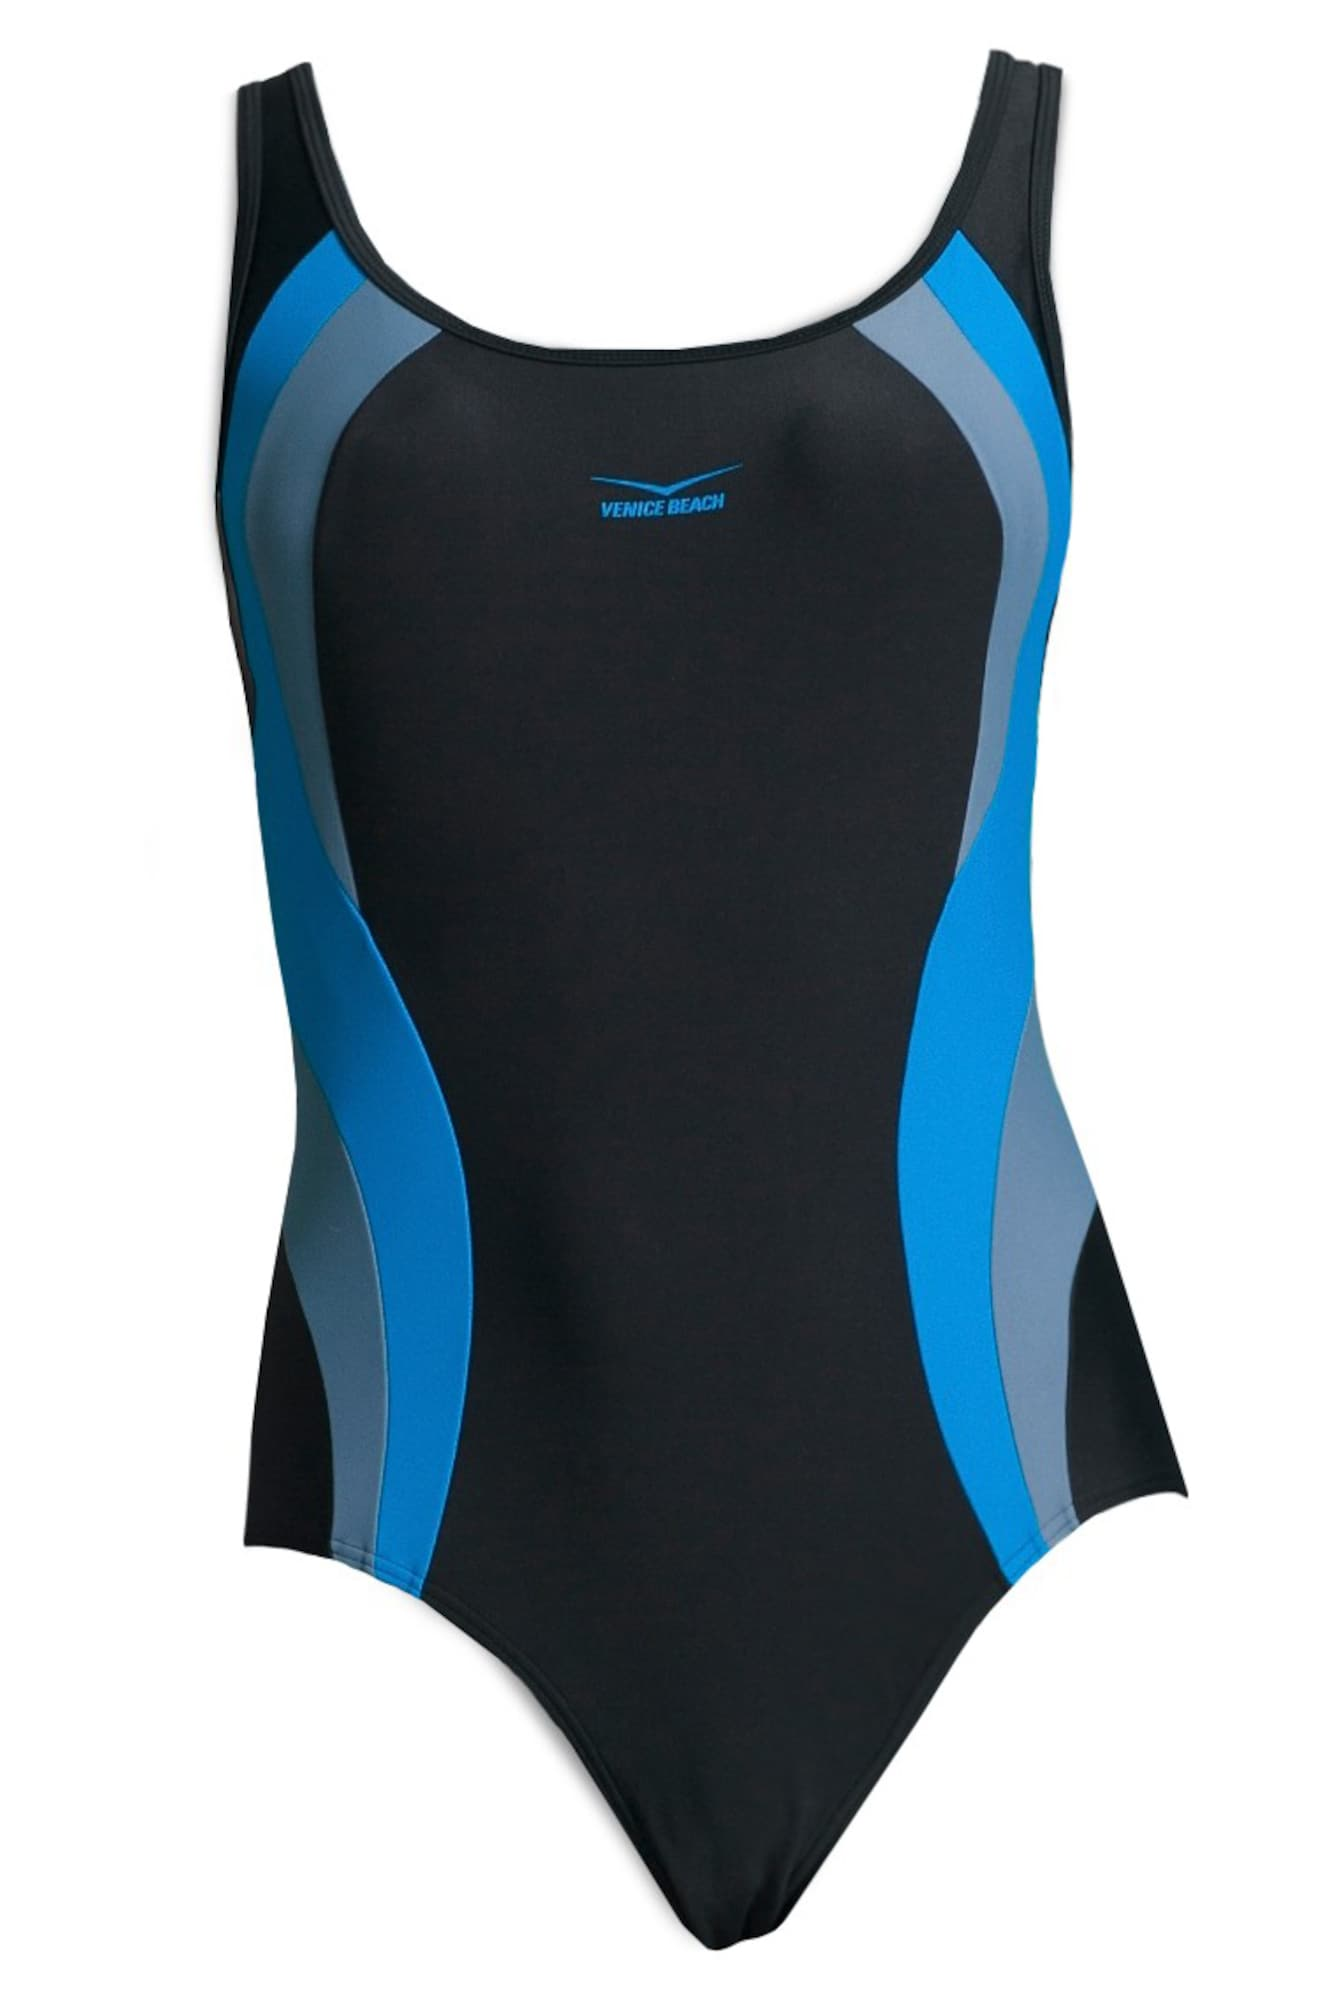 Stahovací plavky modrá černá VENICE BEACH